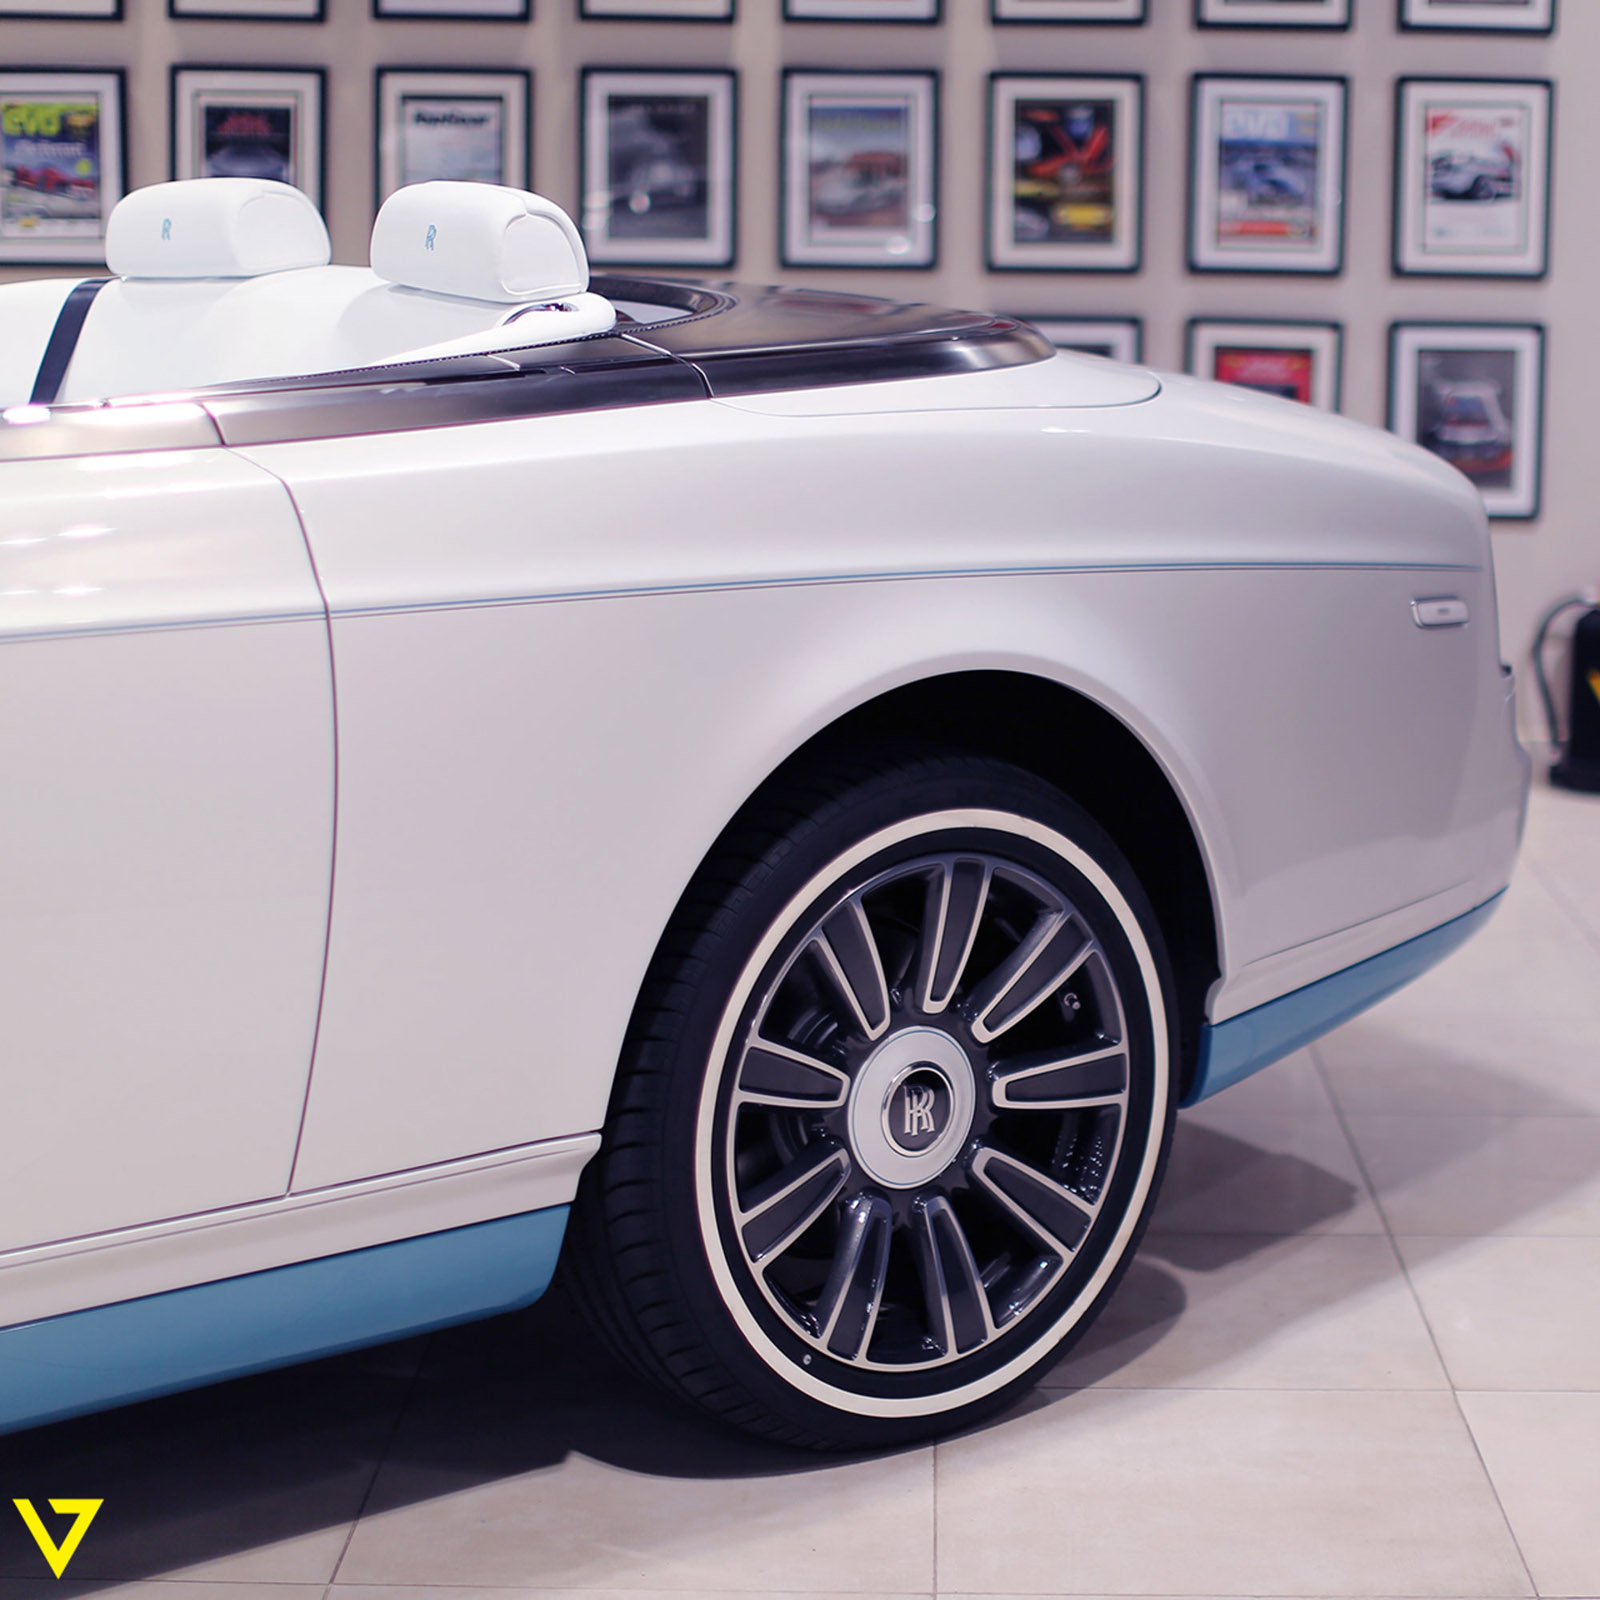 Rolls-Royce_Phantom_Drophead_Coupe_Last-of-Last_edition_12